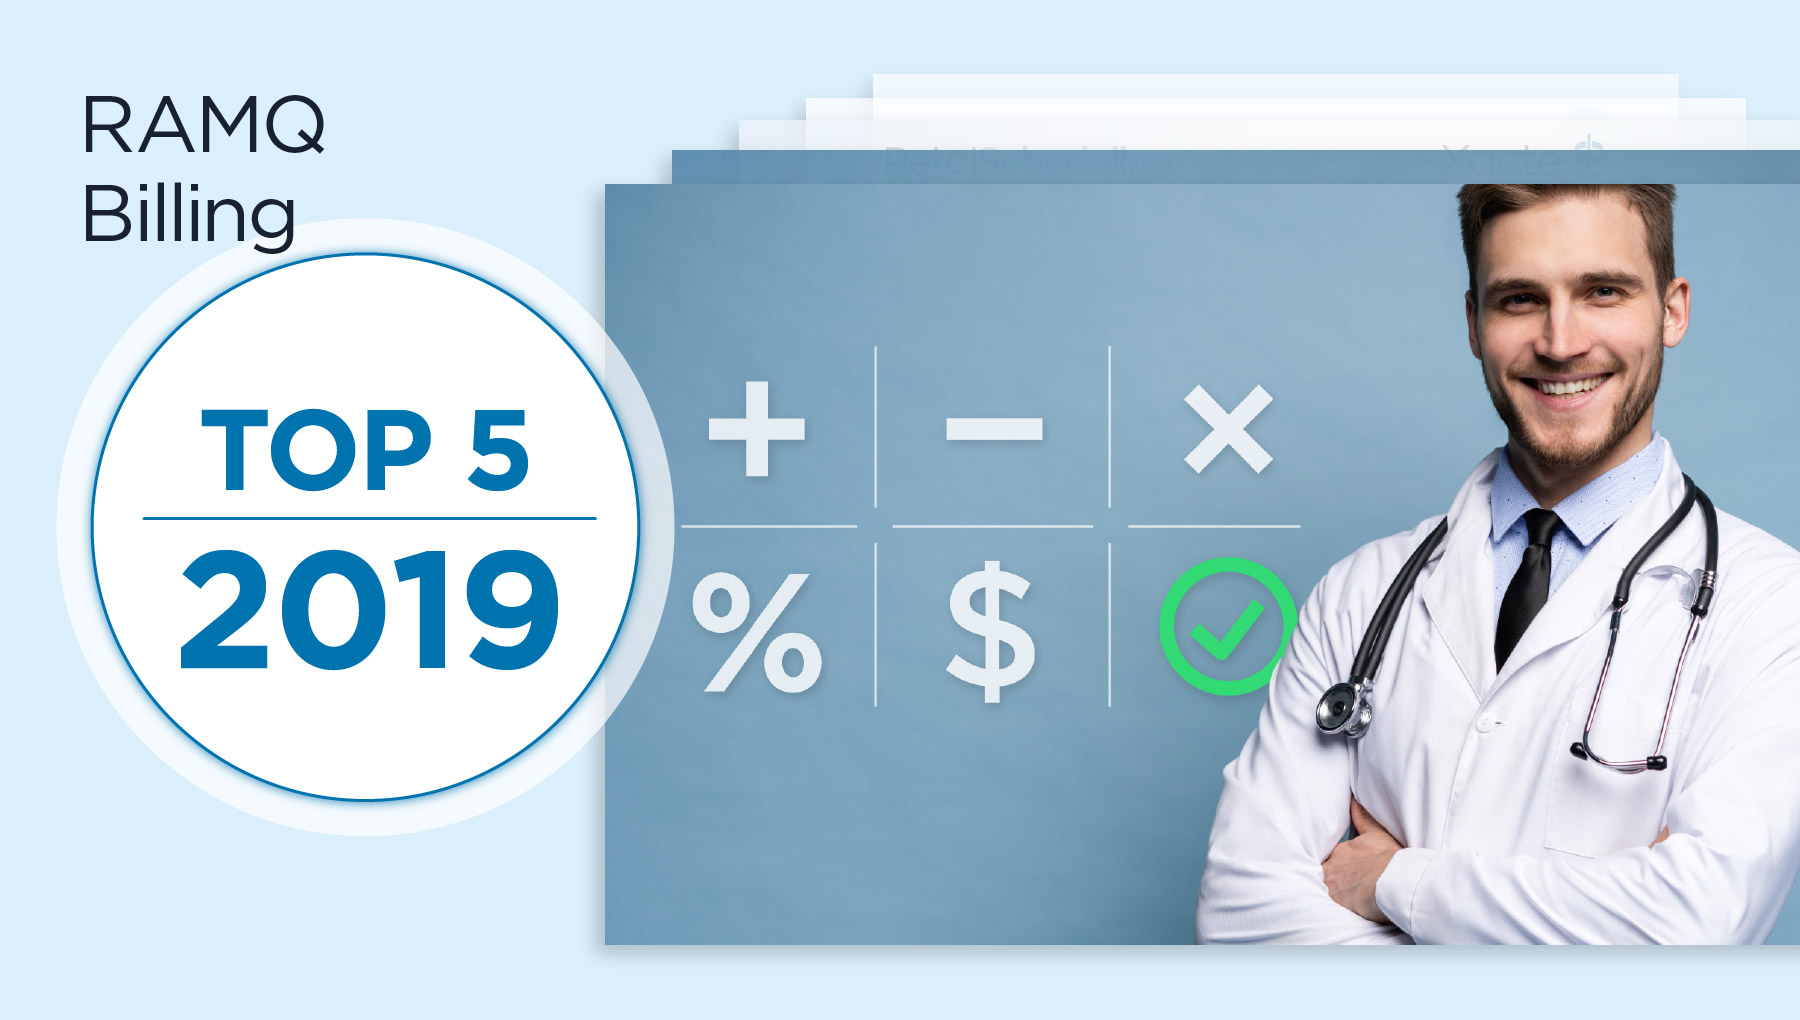 RAMQ Medical Billing Top 5 2019